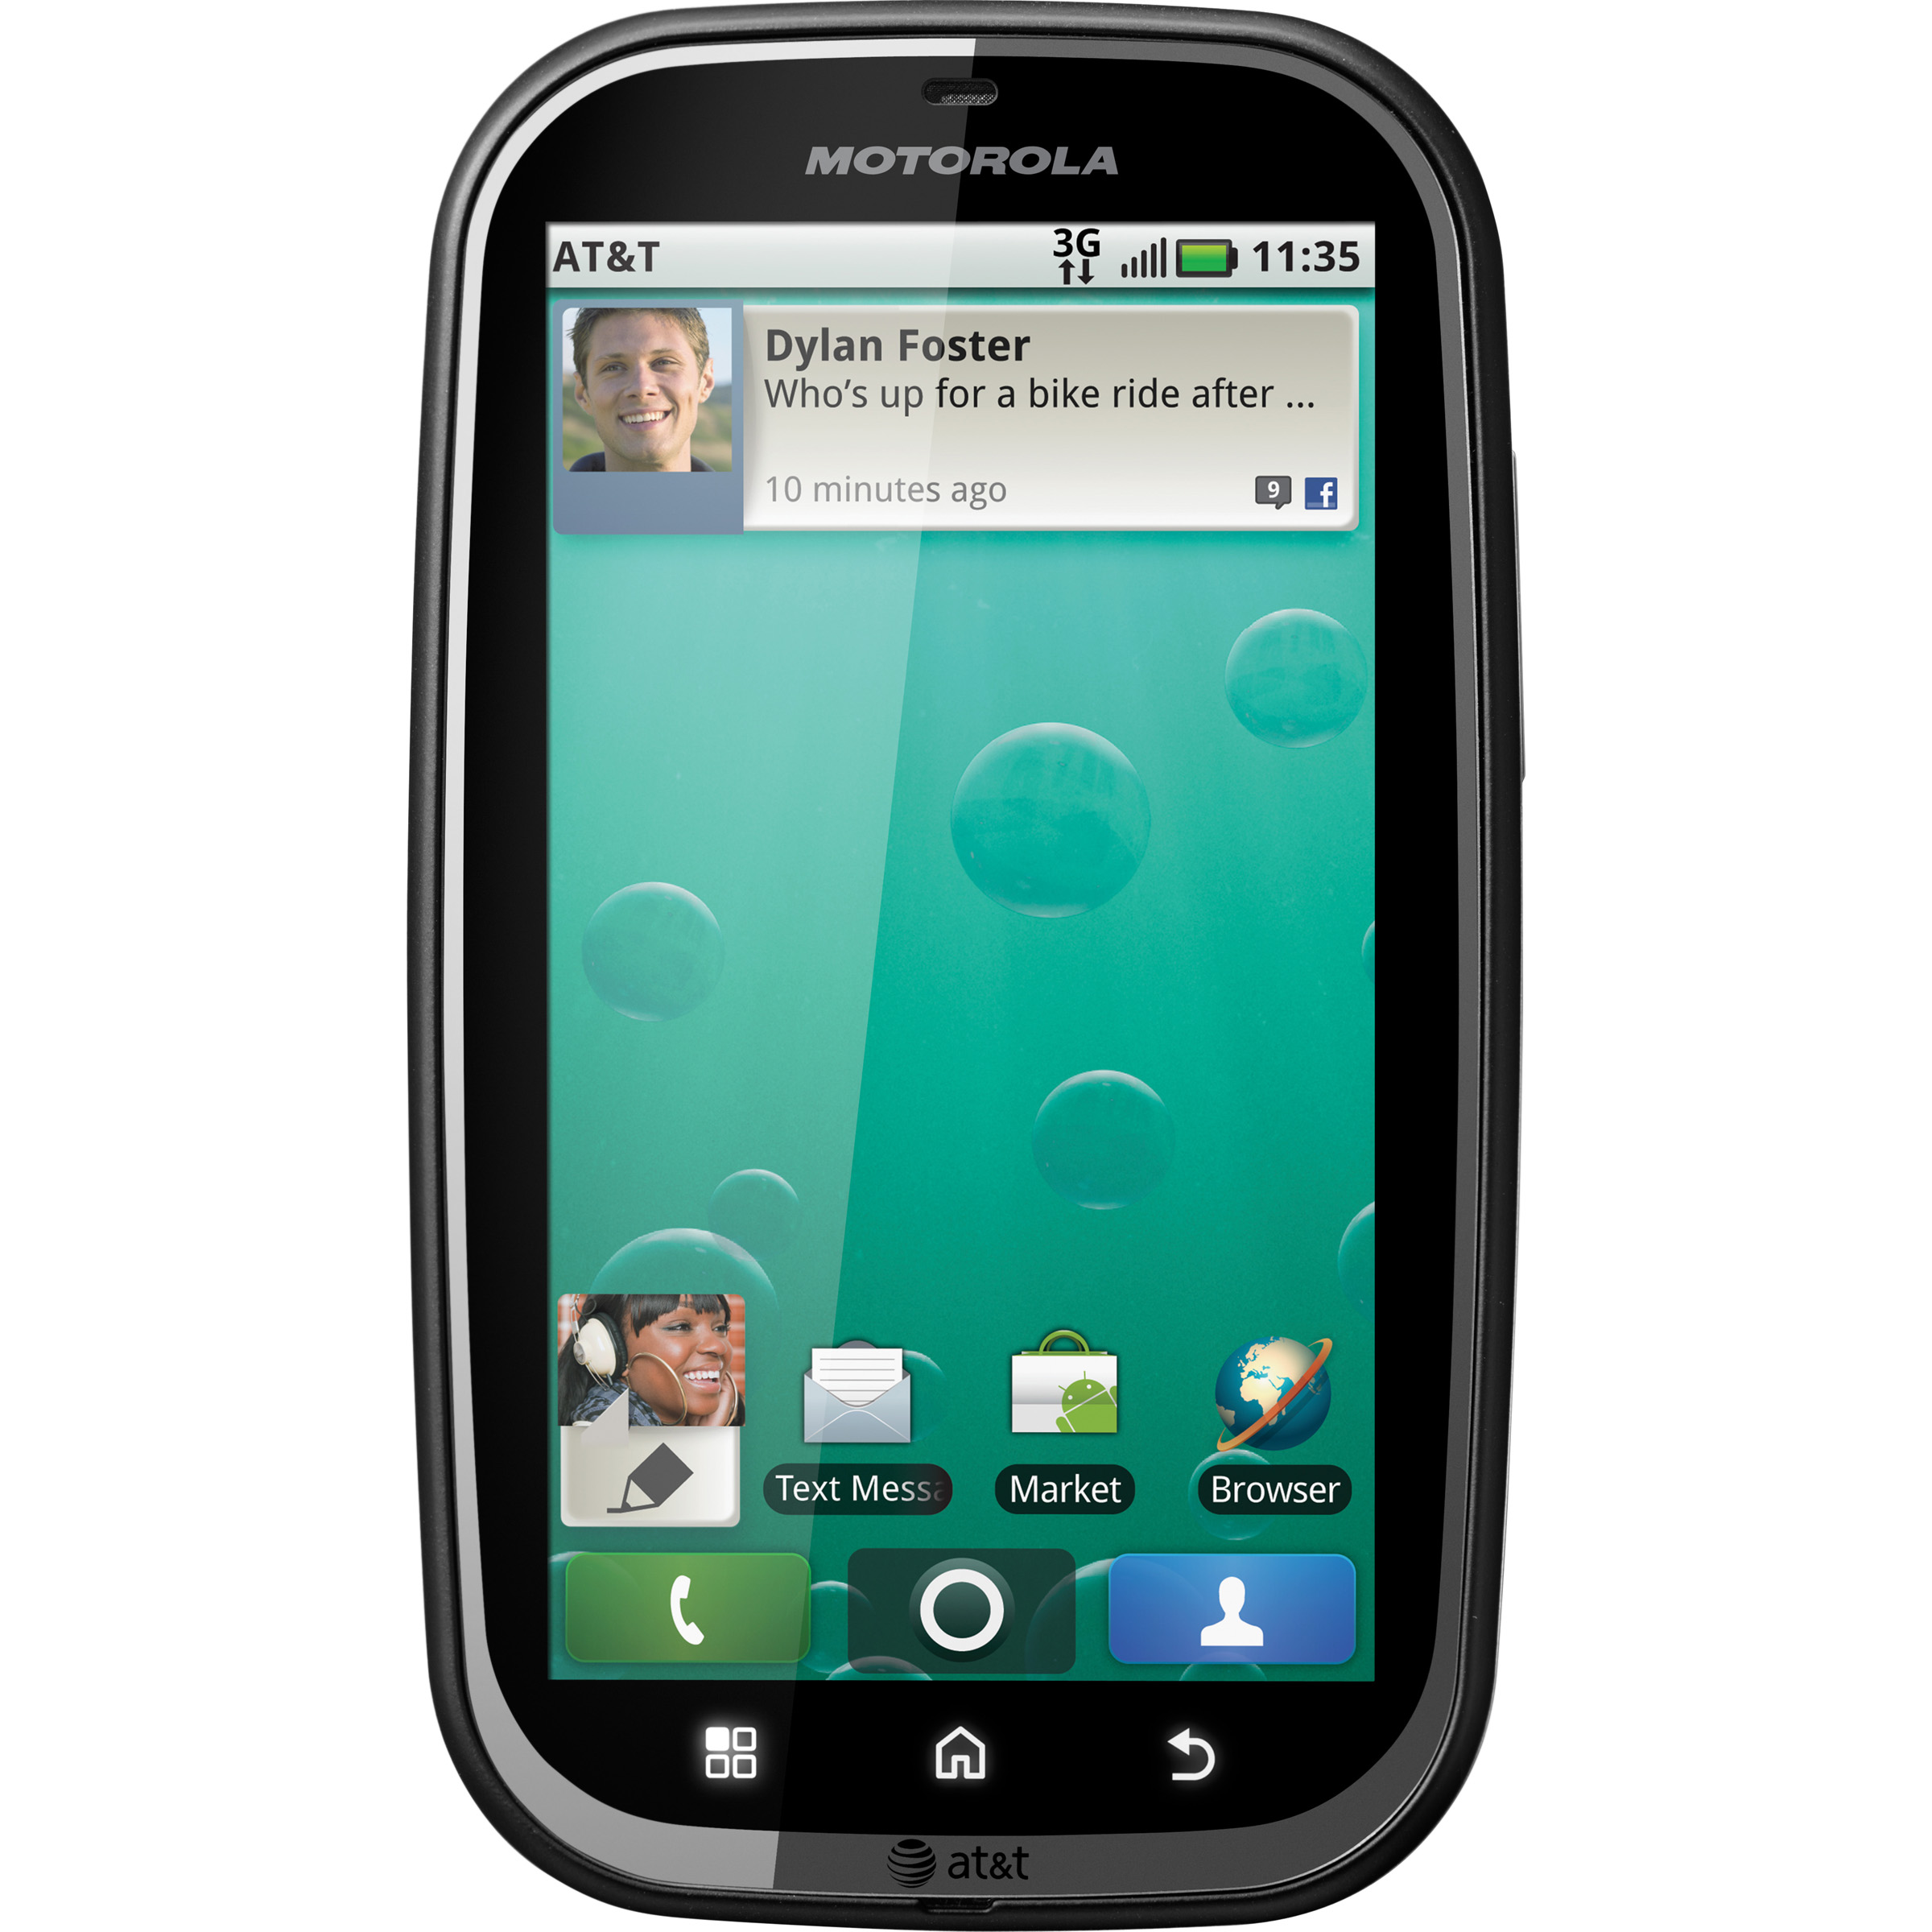 Motorola BRAVO Smartphone - Wireless LAN - 3G - Bar - Black - SIM-free - Android 2.1 Eclair - Texas Instruments800 MHz - 512 MB RAM - 2 GB microSD - 3.7